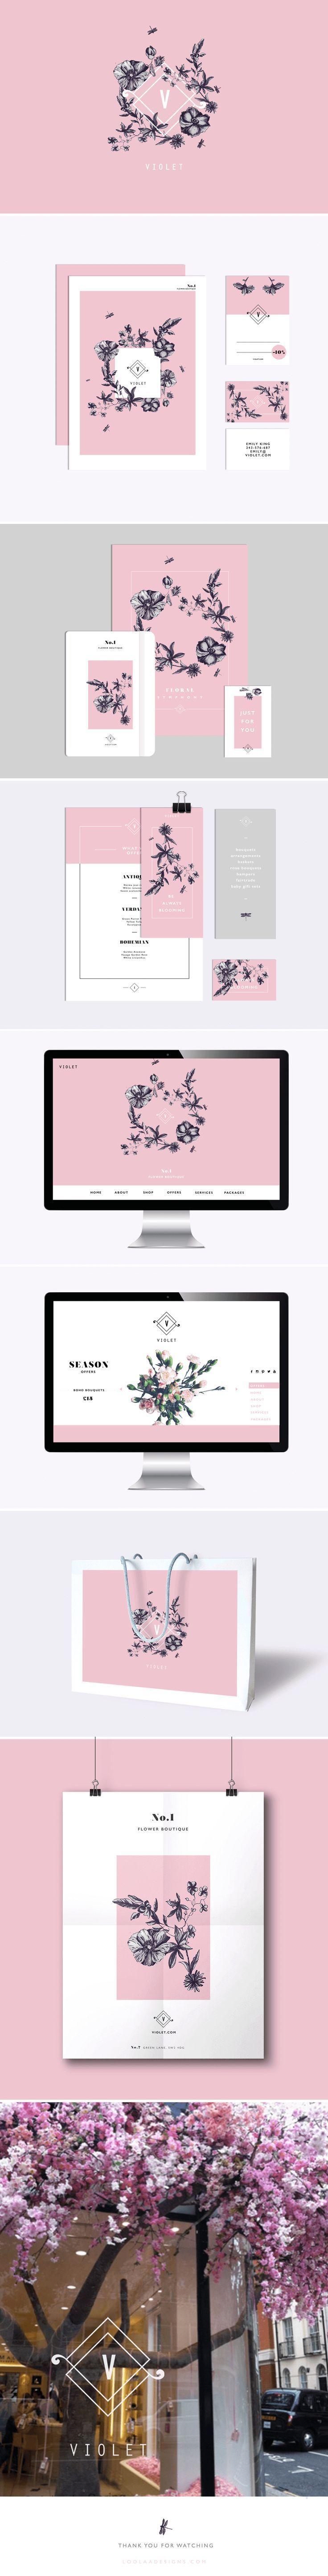 Branding and logo design / hand drawn boho flowers + pink + grey // loolaadesigns.com